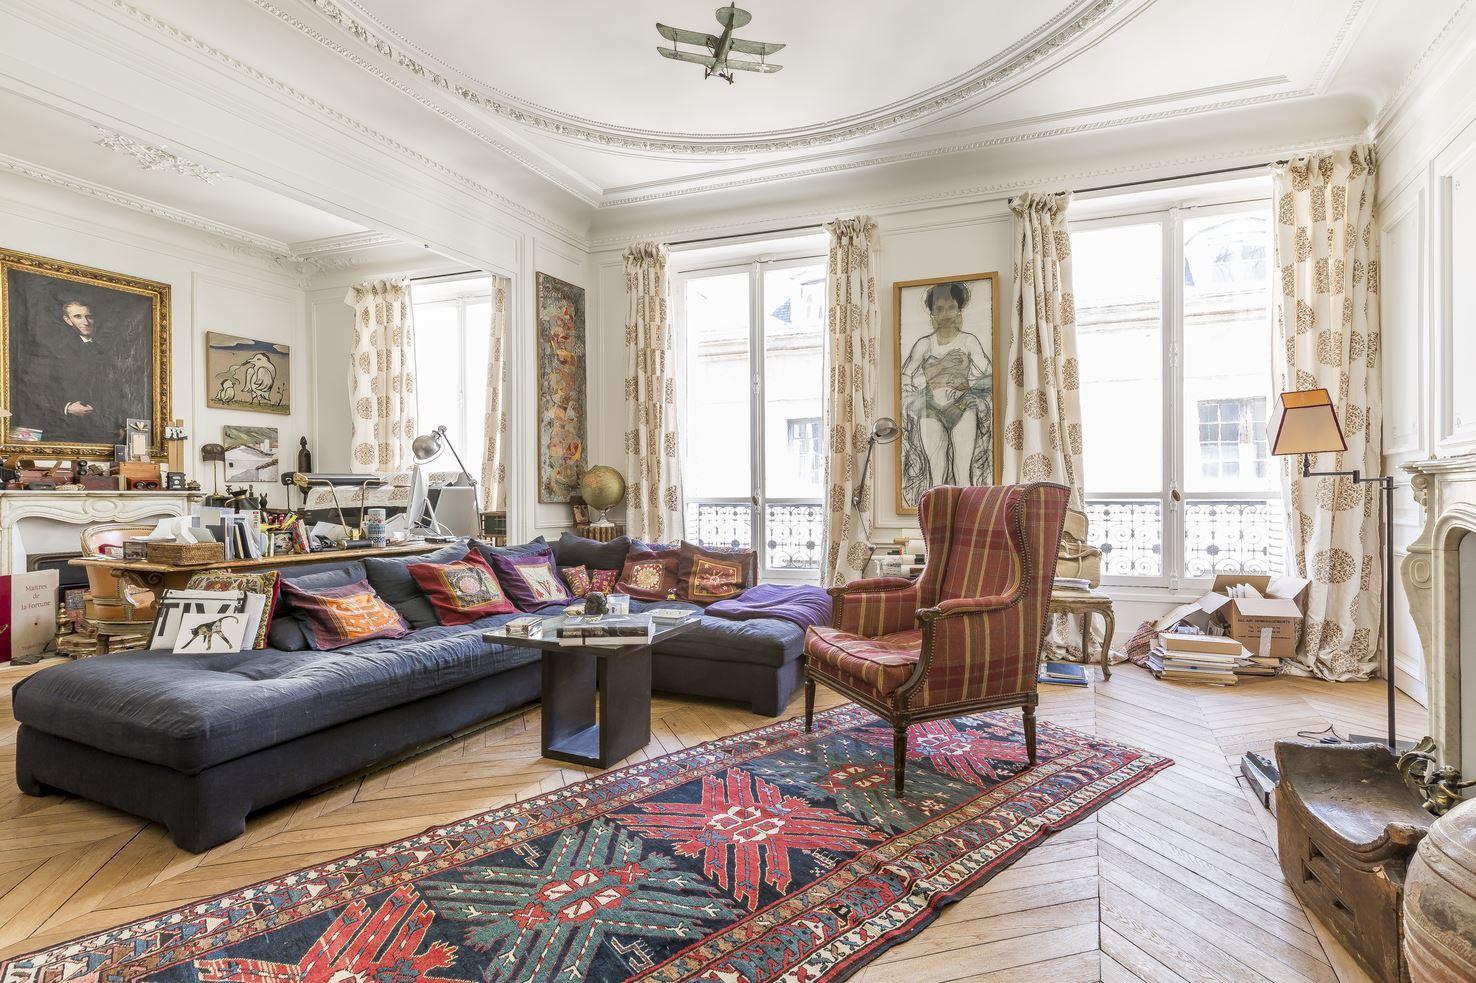 Property For Sale at 75006 - Apartment for sale rue de Seine